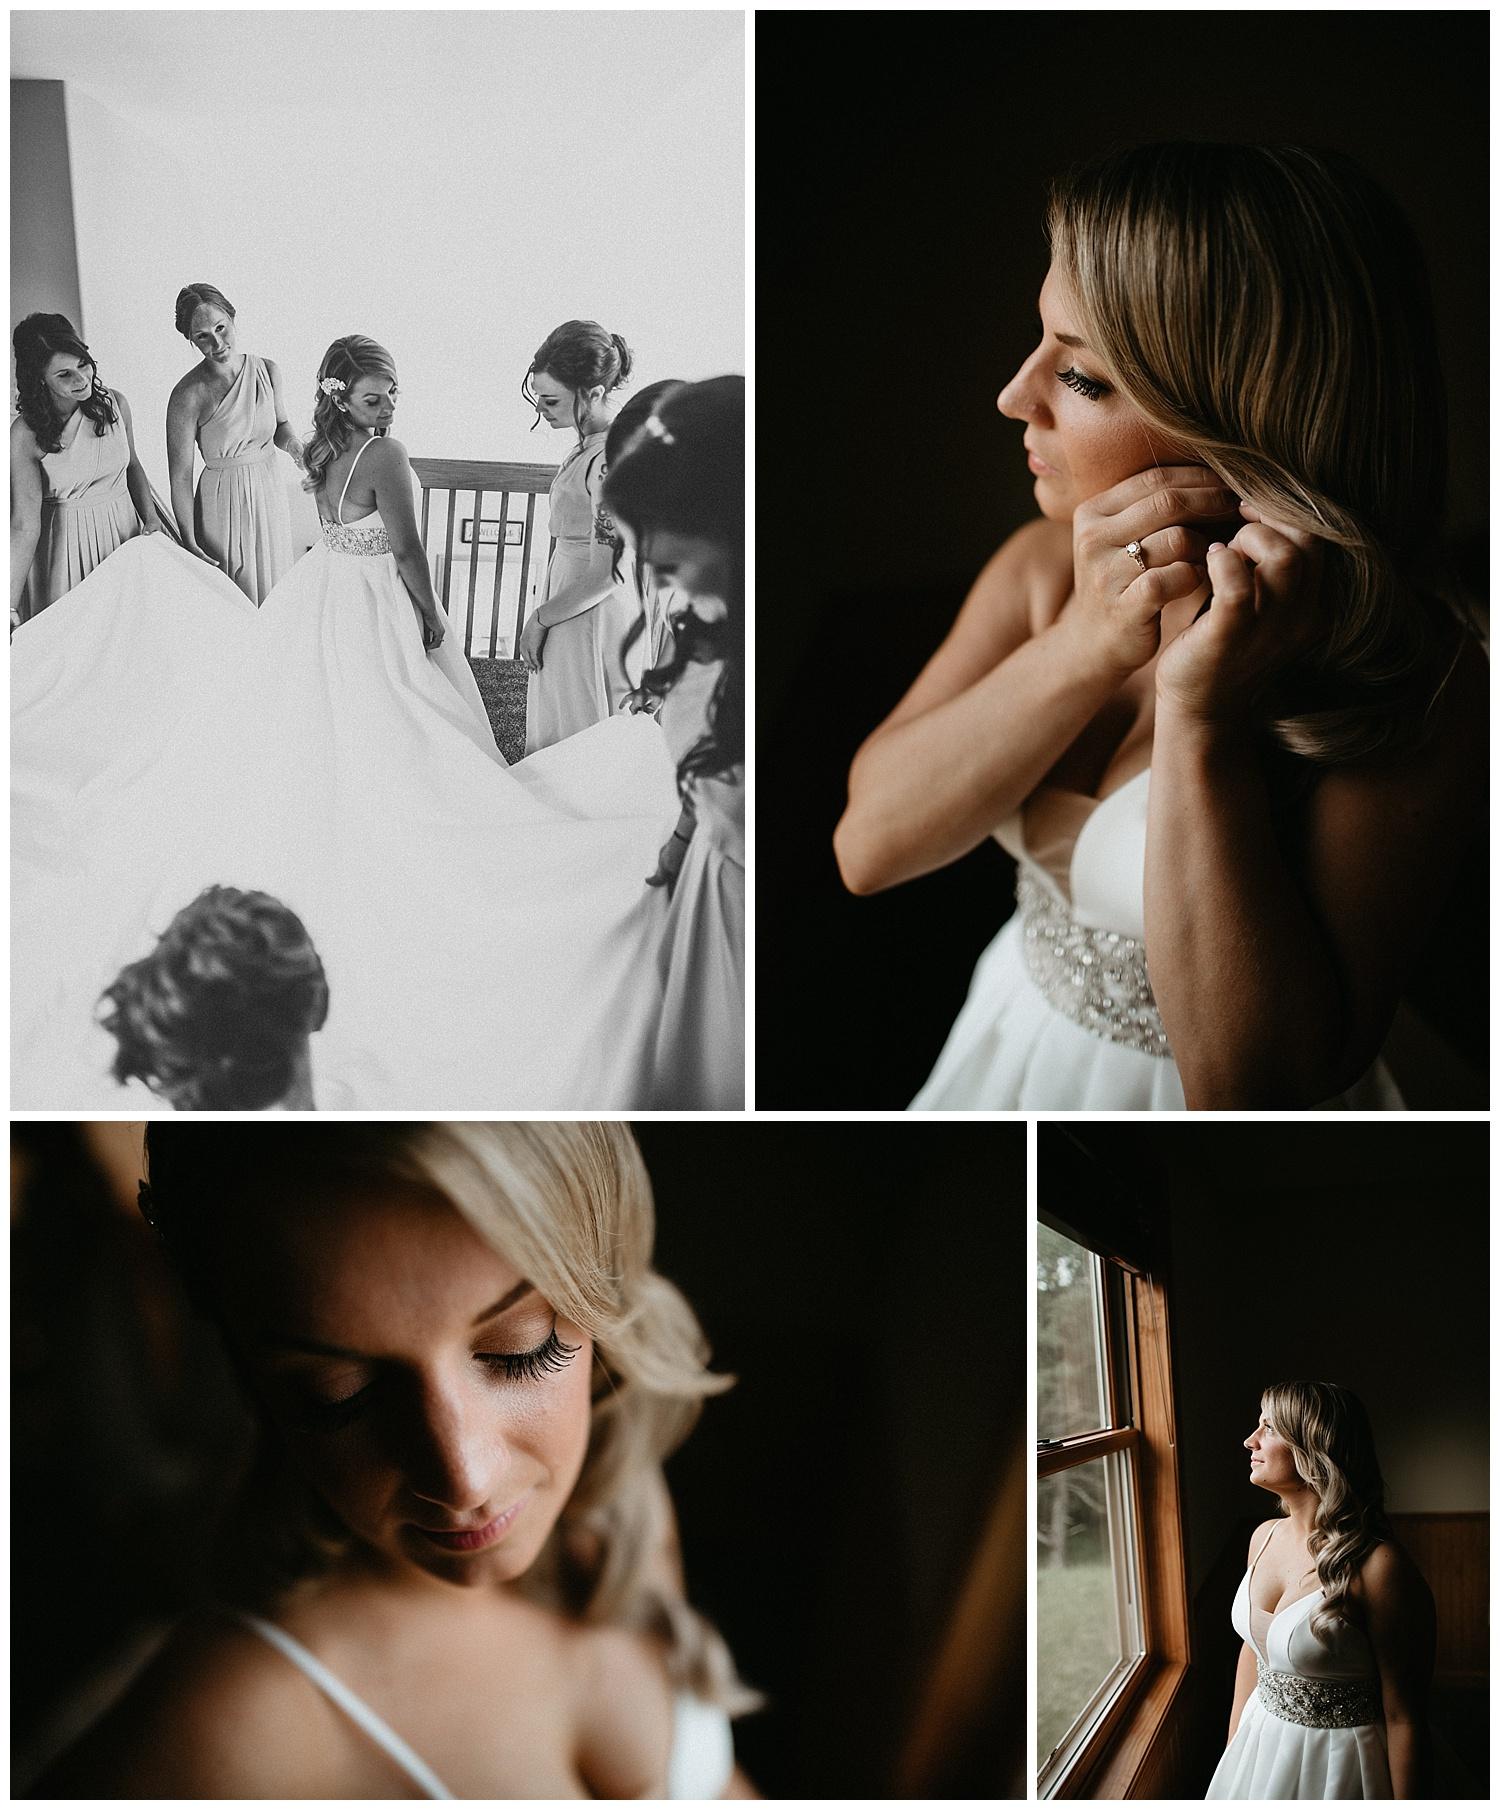 Destination-Wedding-Photographer-in-NEPA-Palmerton-PA_0005.jpg